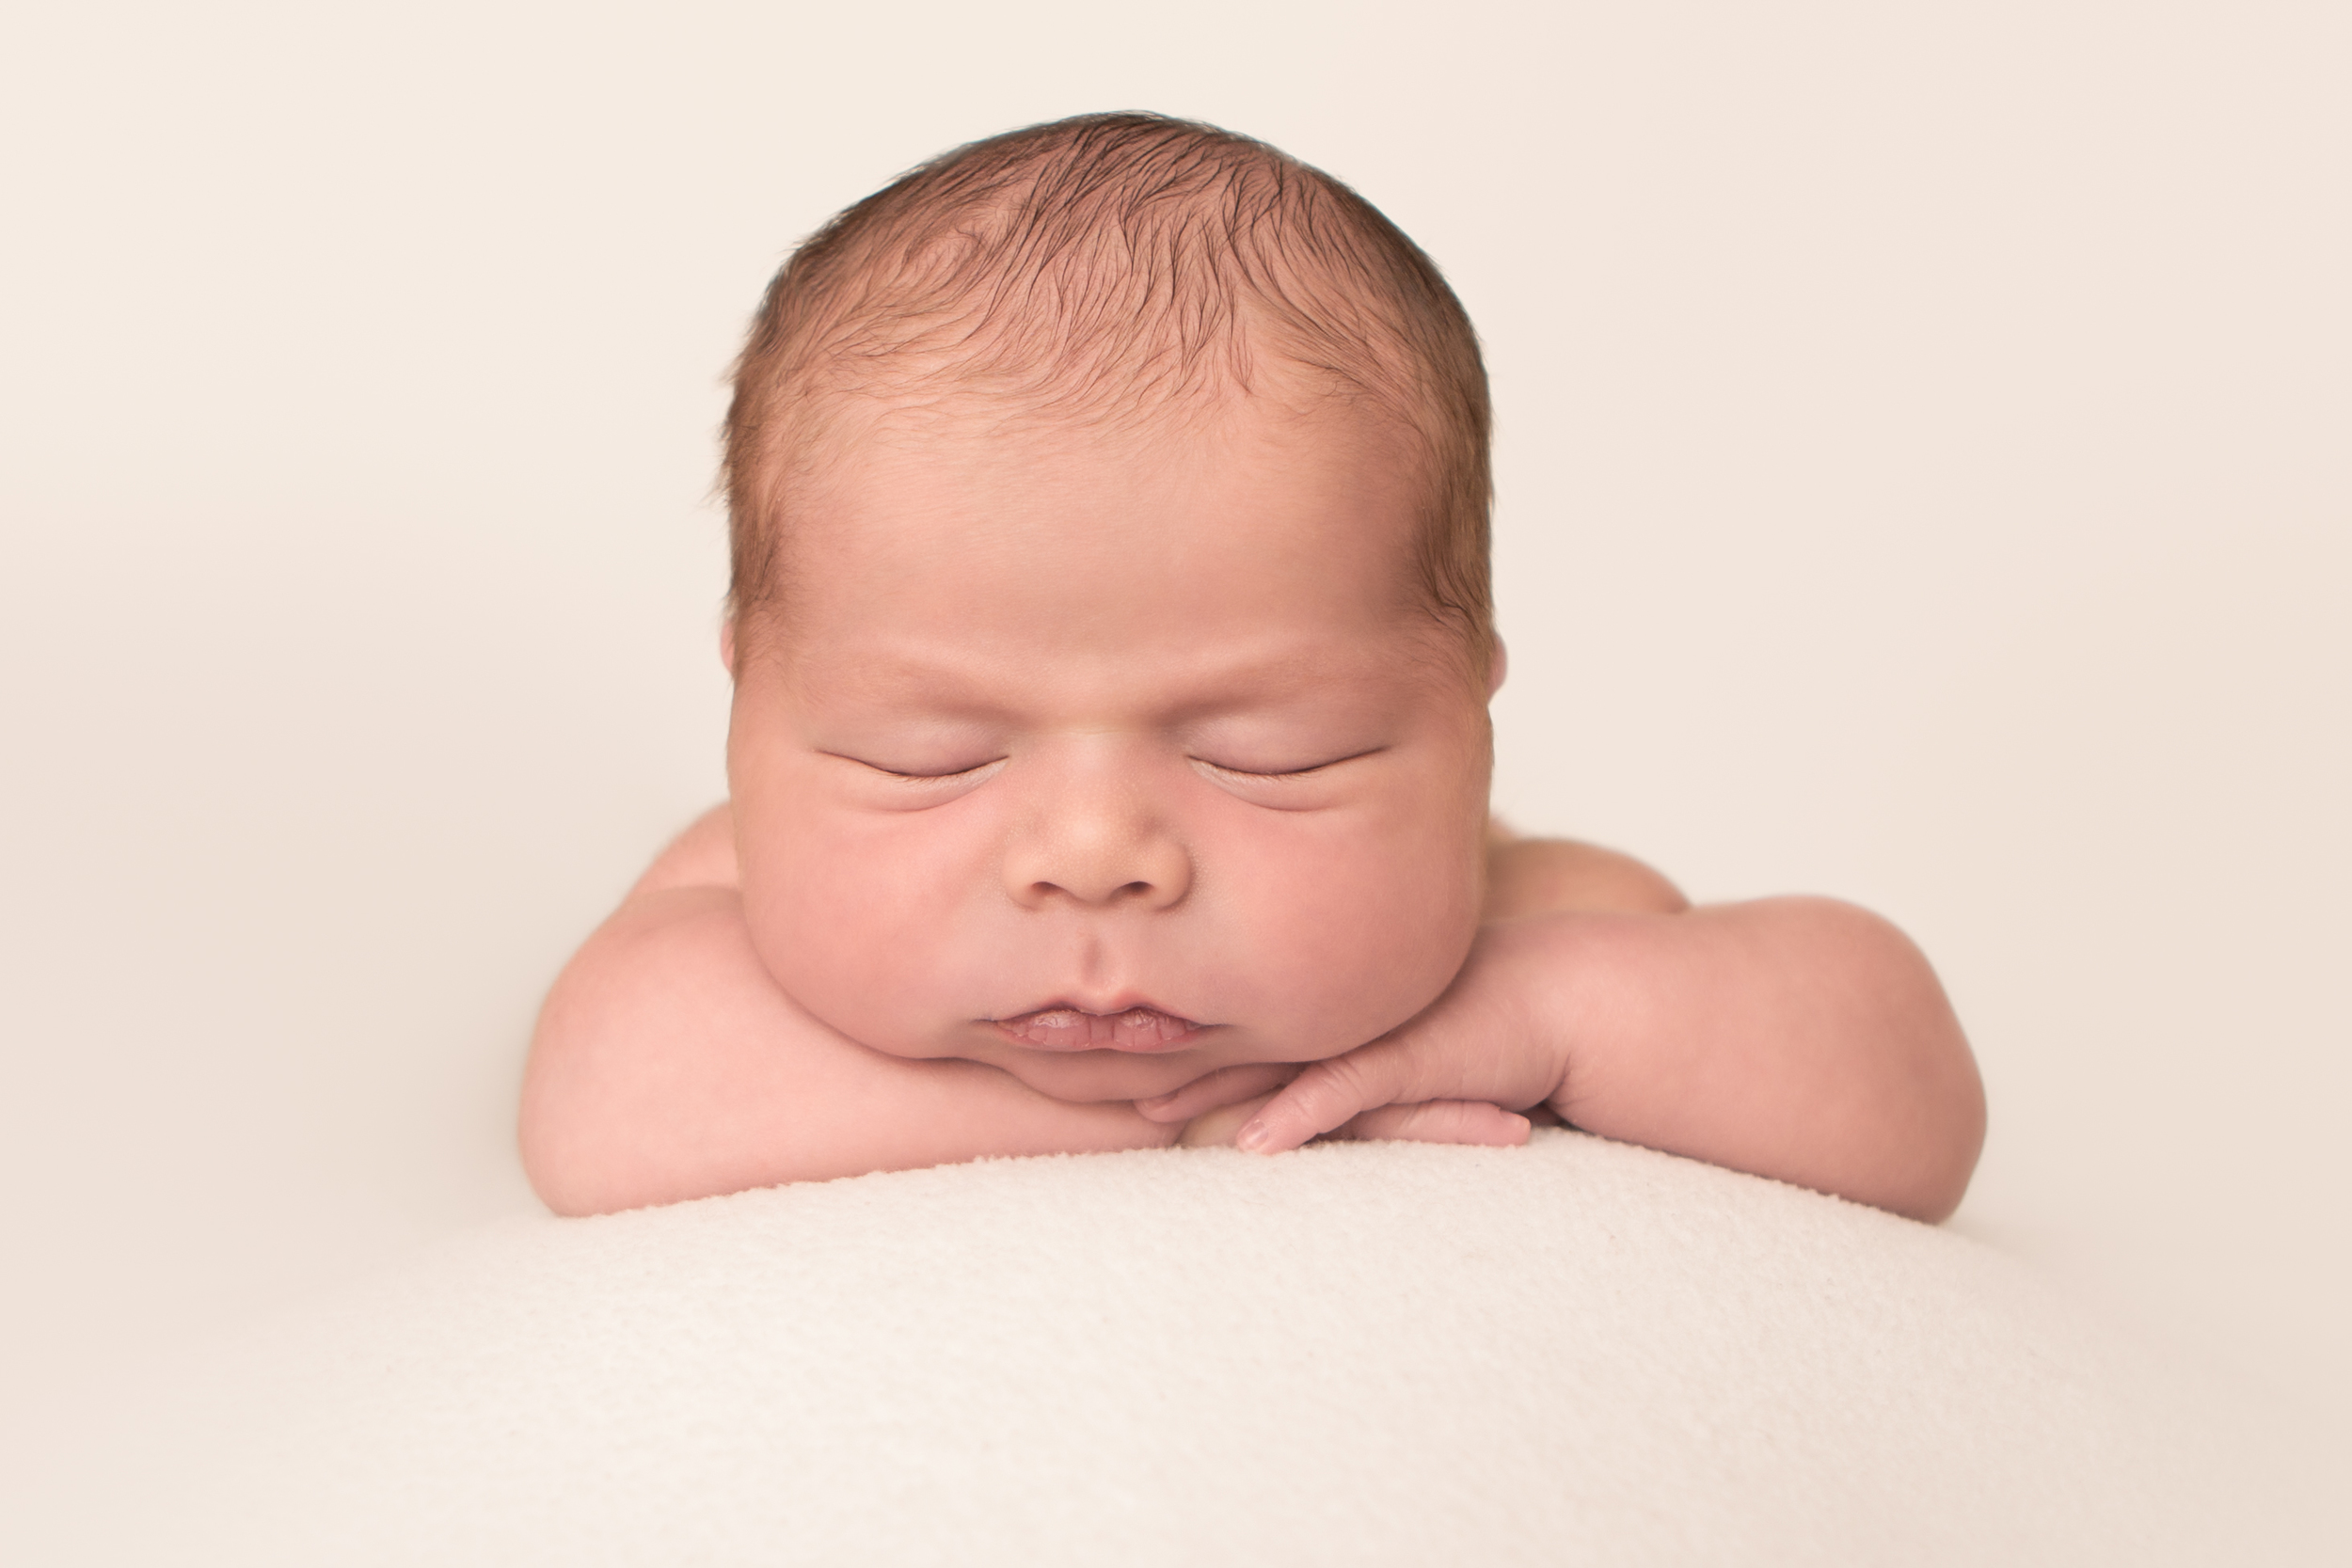 Newborn baby boy chubby, on cream creme white fabric blanket backdrop, head on hands wrists bean bag pose,  Westchester County, New York newborn photographer, Amanda Noelle Photography.